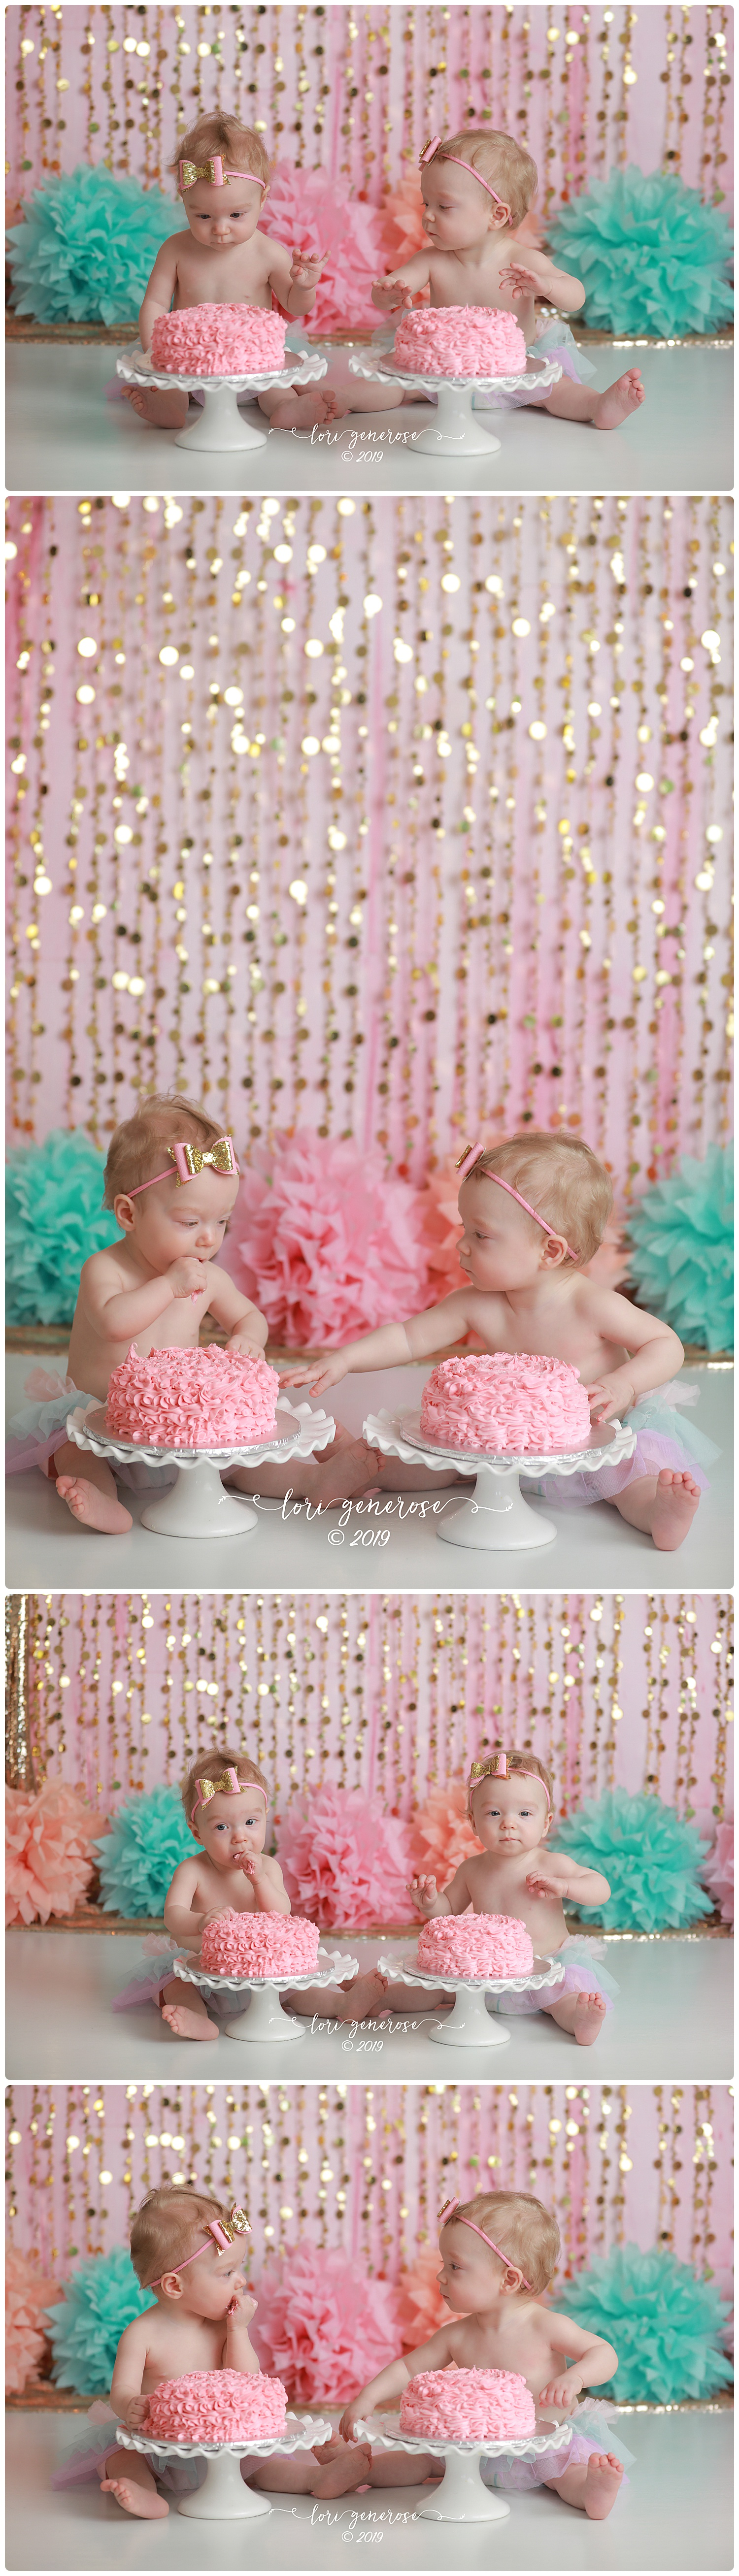 lgphotographylorigenerosepinkandgoldcakesmashtwinsfloralfirstbirthdaytwingirls.jpg